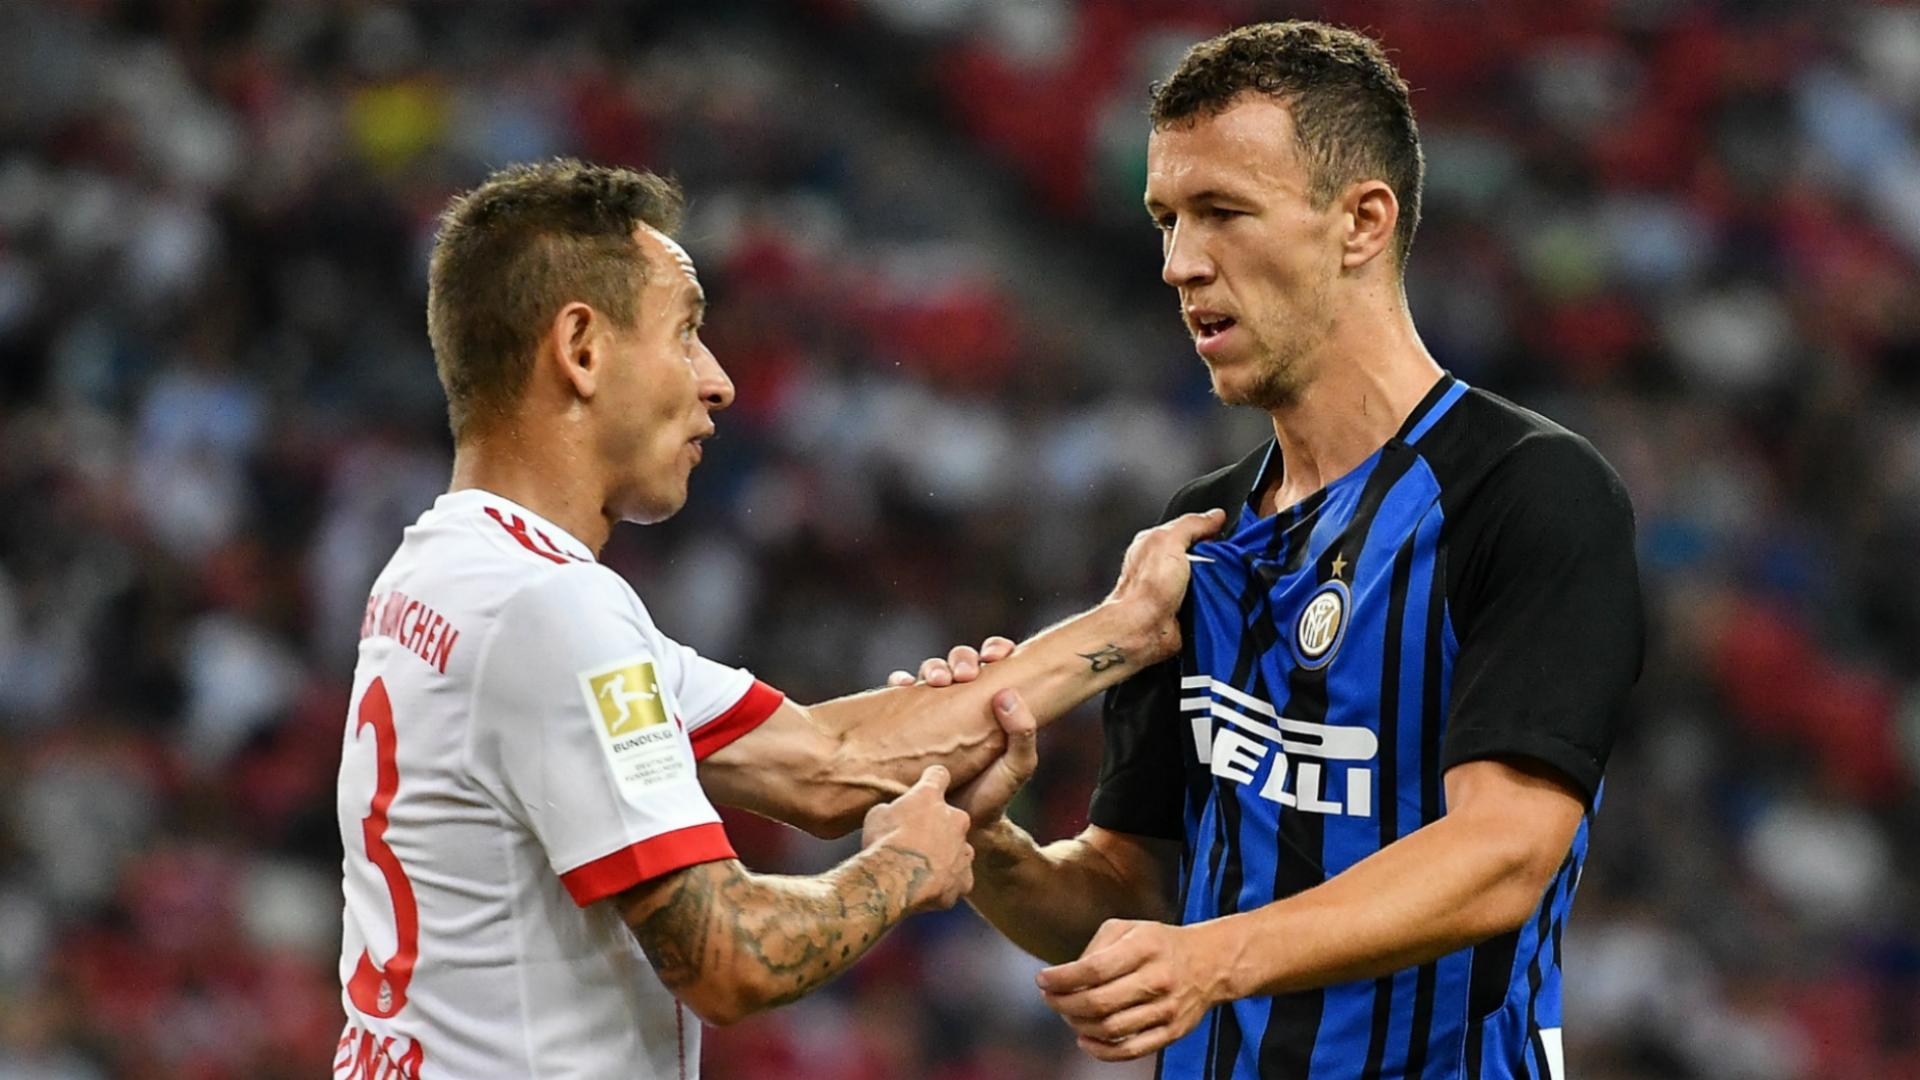 Inter will